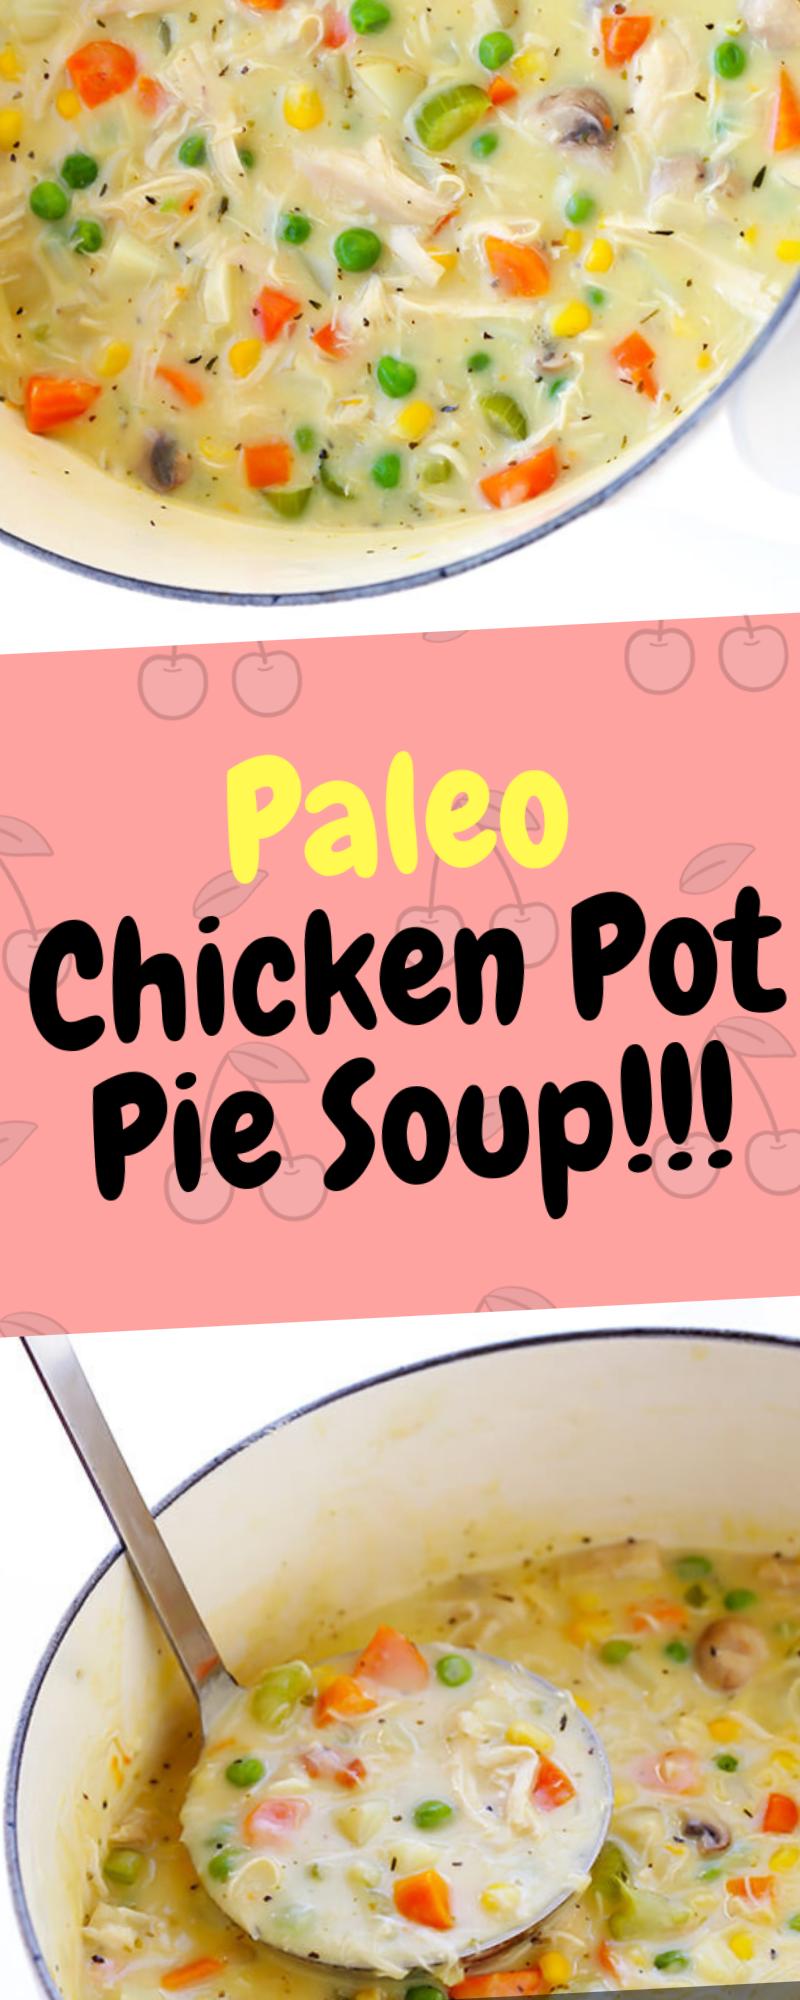 Paleo Chicken Pot Pie Soup Chicken pot pie soup, Paleo